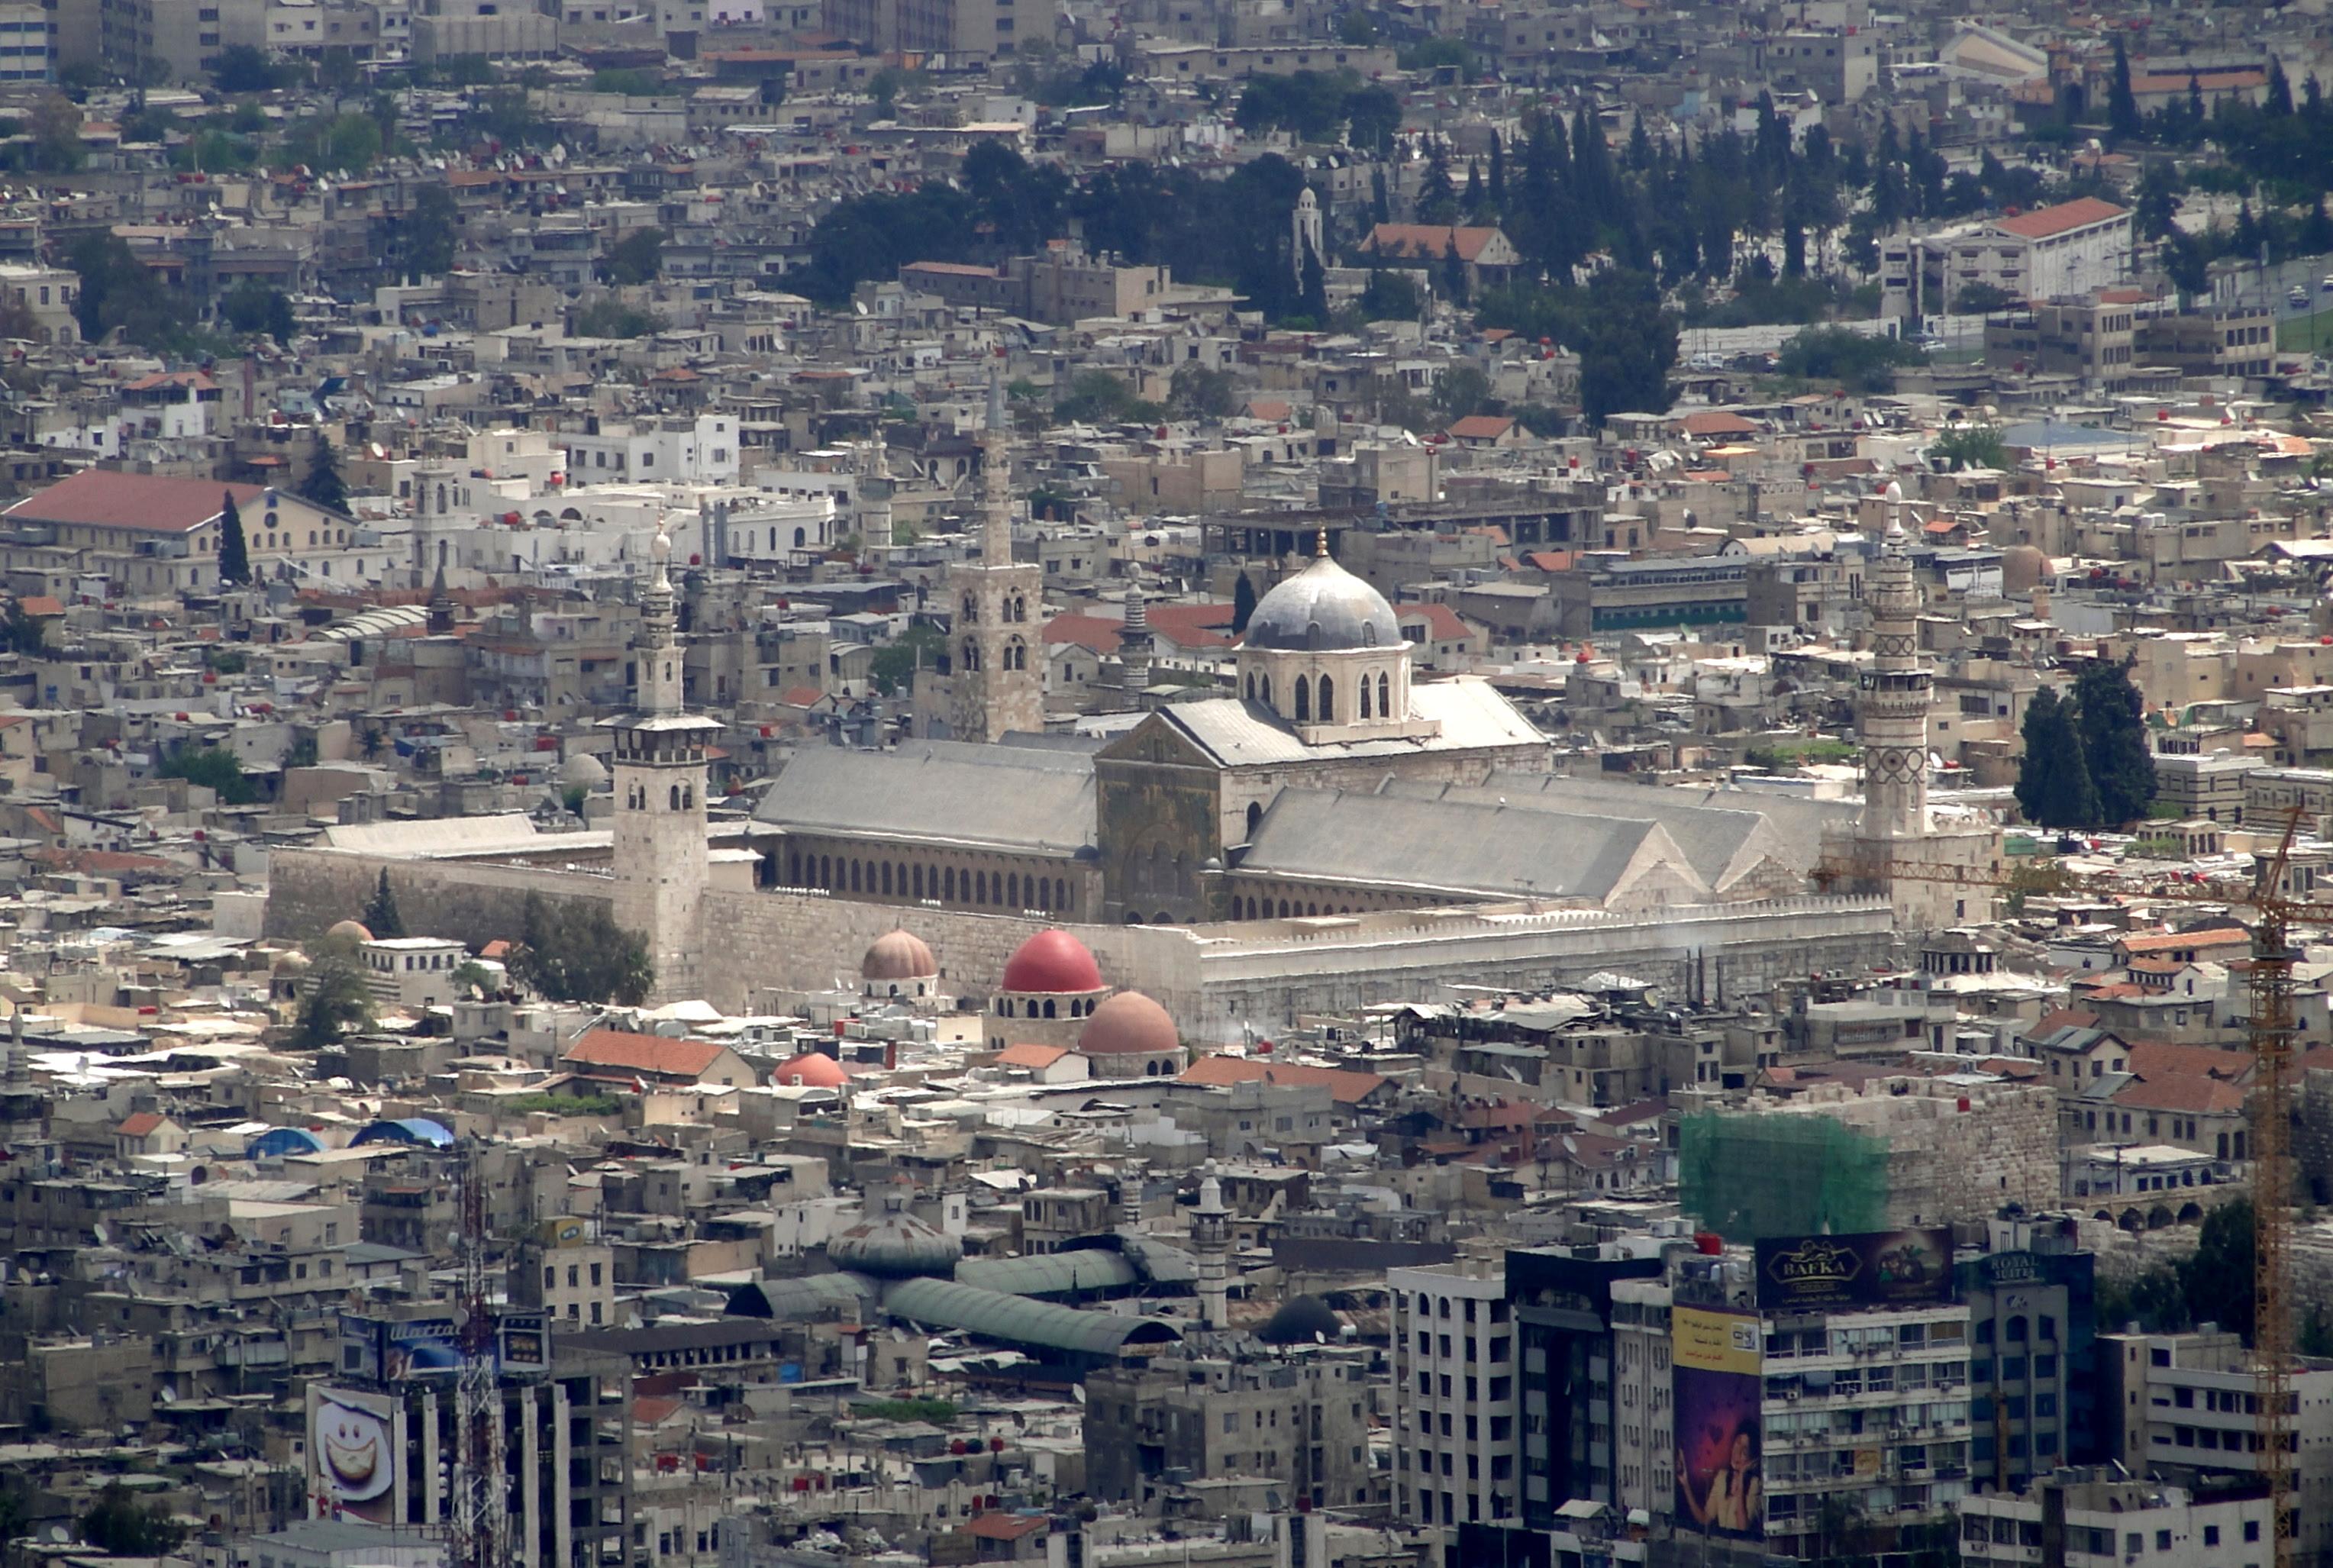 Born in : DAMASCUS ولدت في : دمشق